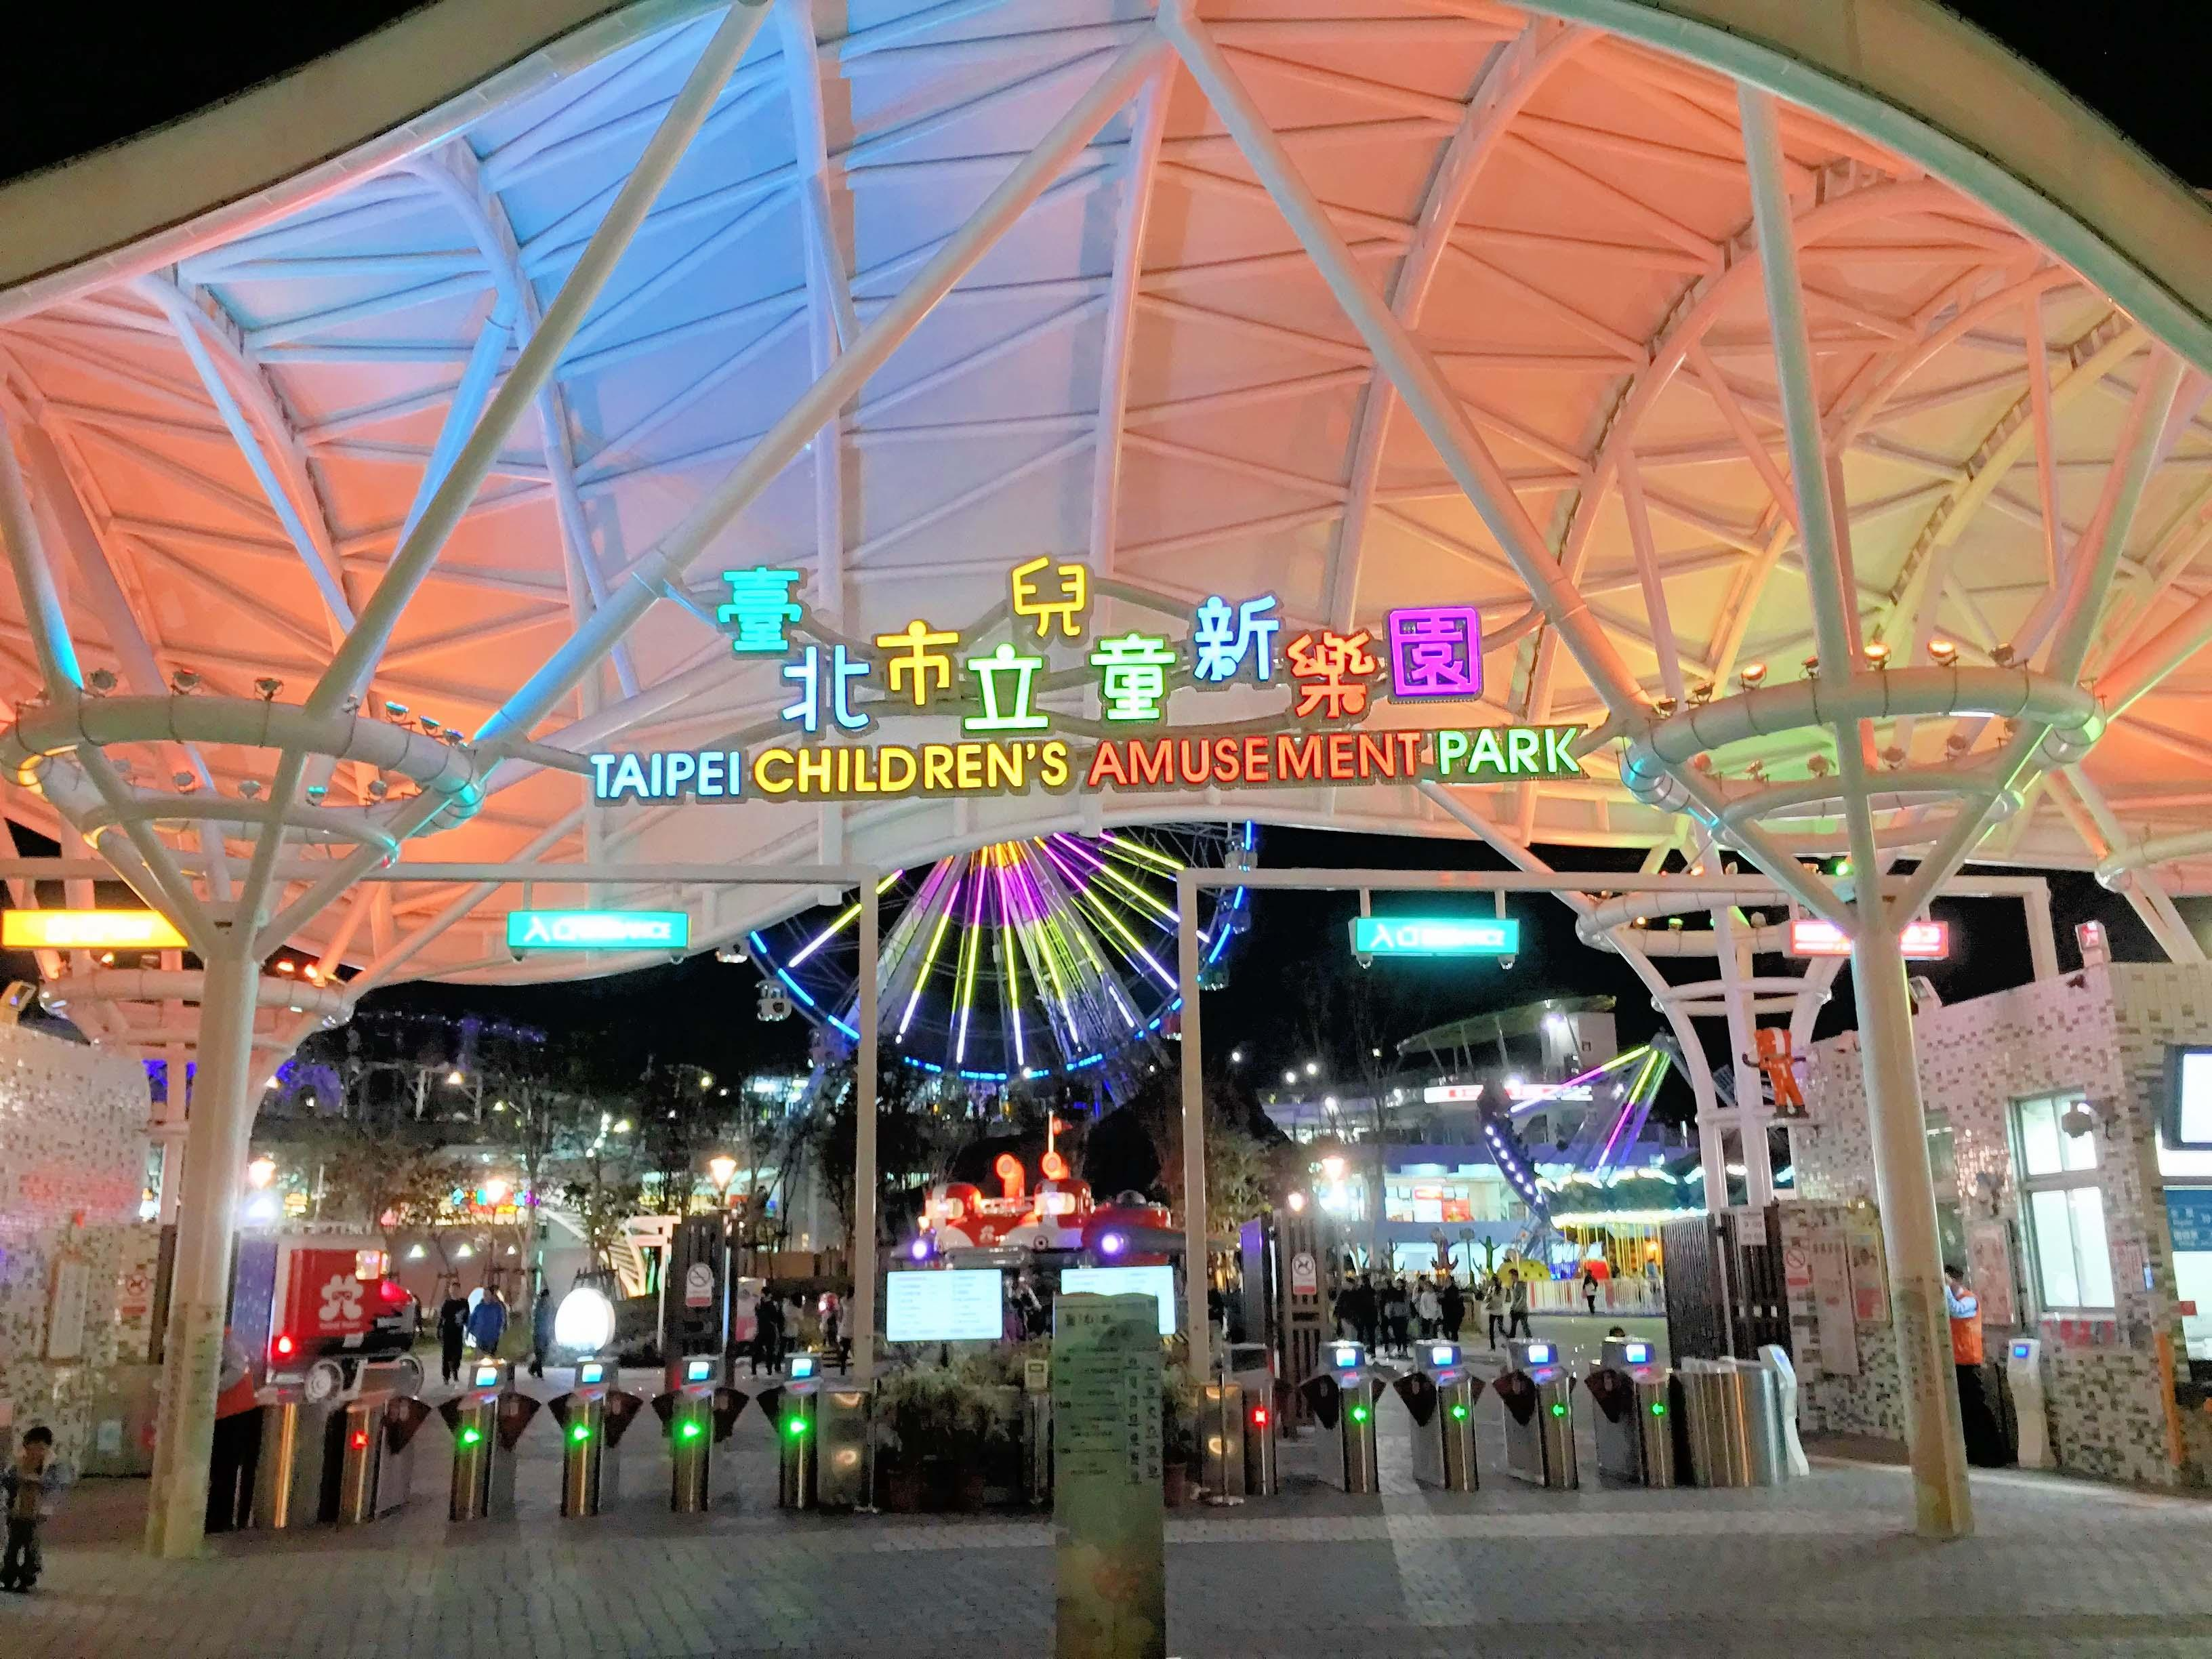 【Fun‧紛樂園】放電一流!專為小朋友設計的兒童新樂園 │台北自由行套票3-31天